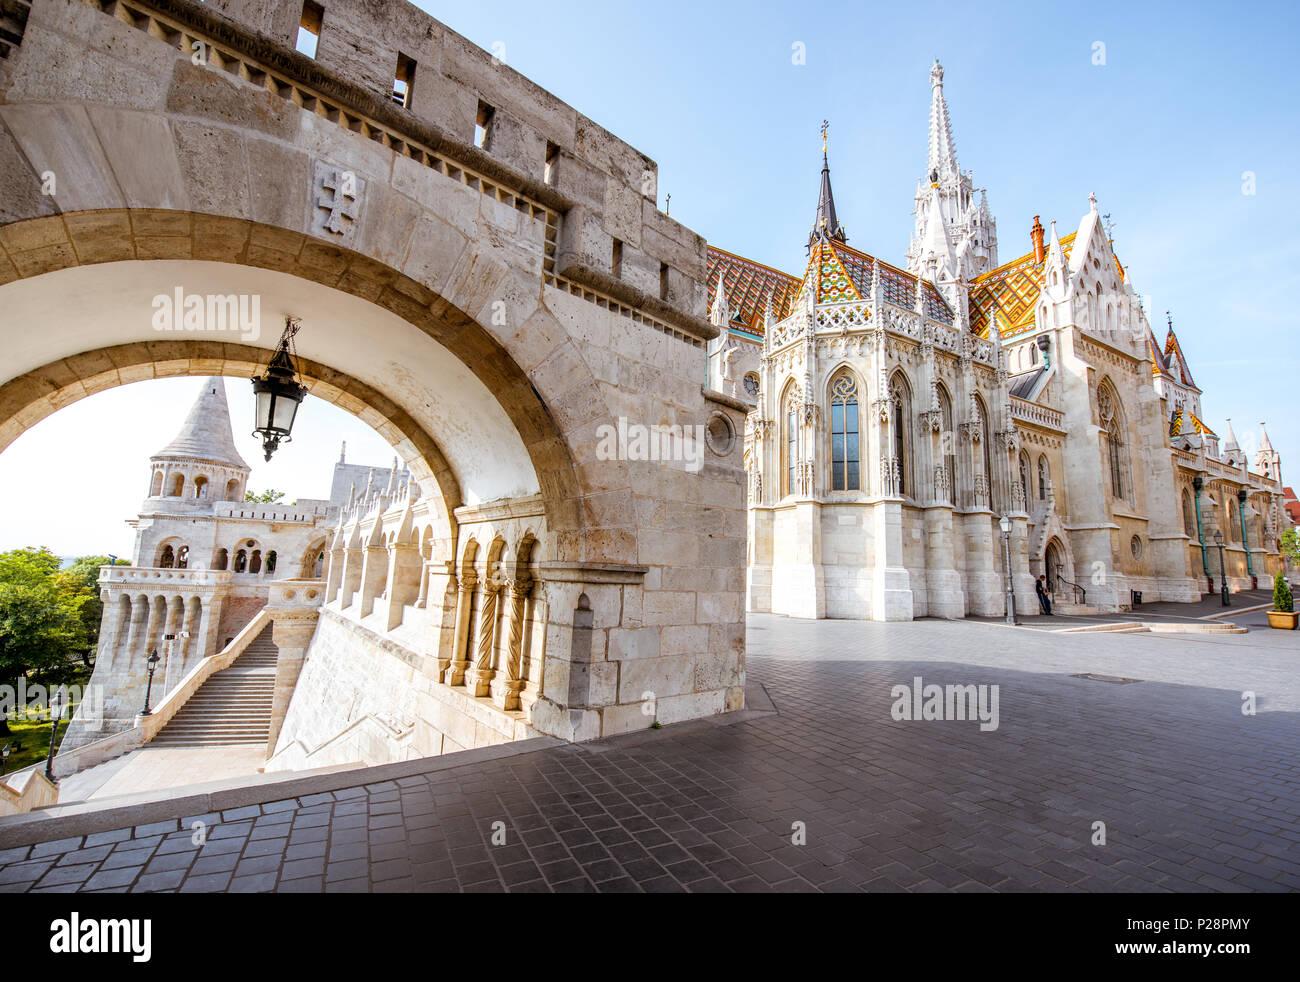 Fisherman's bastion in Budapest - Stock Image